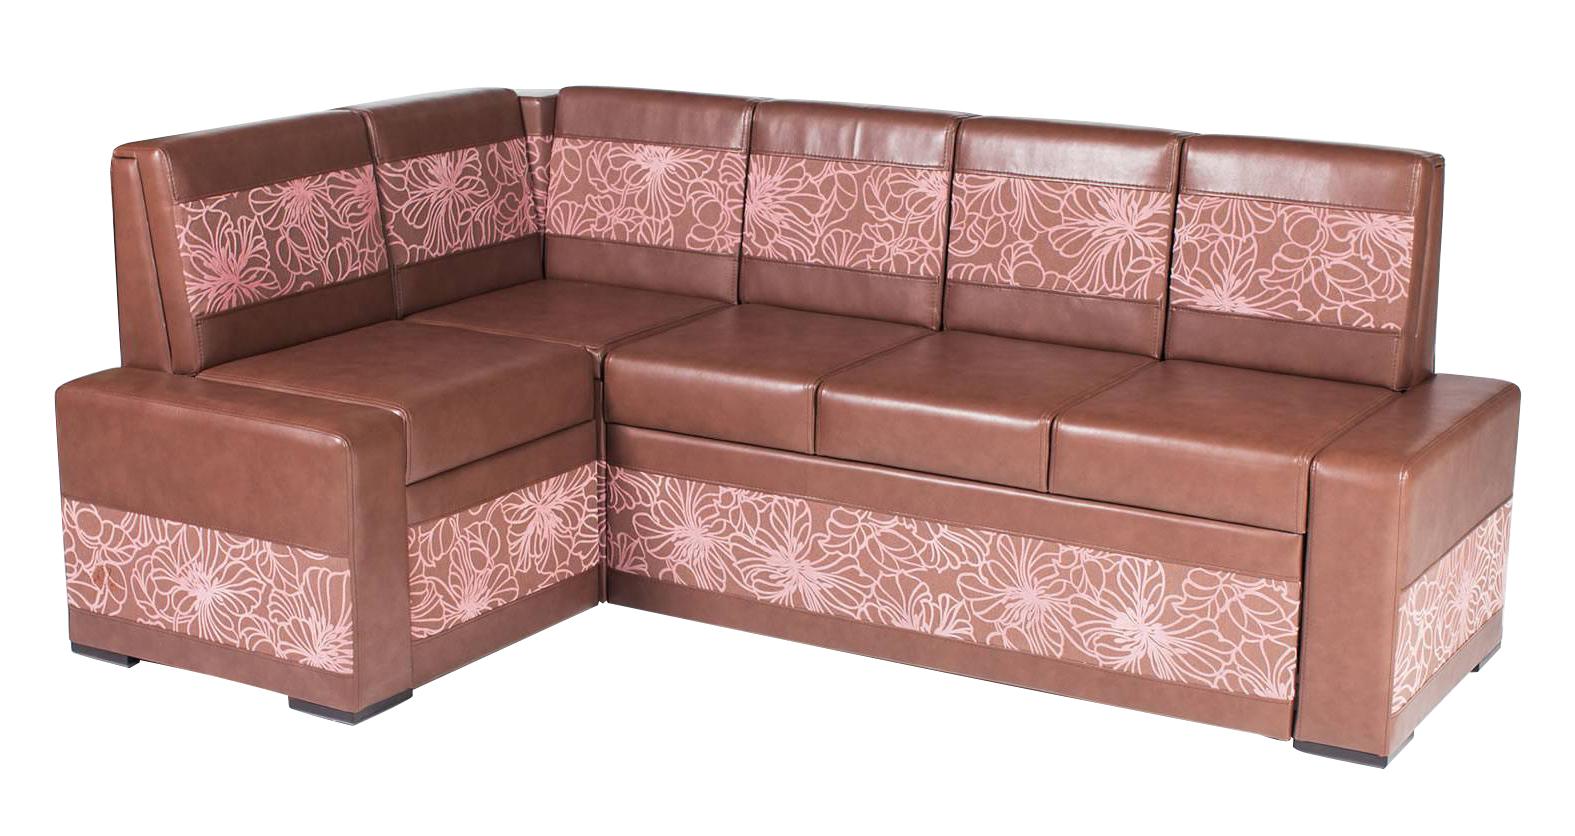 Кухонный угловой диван Остин-М диван остин от бора 74